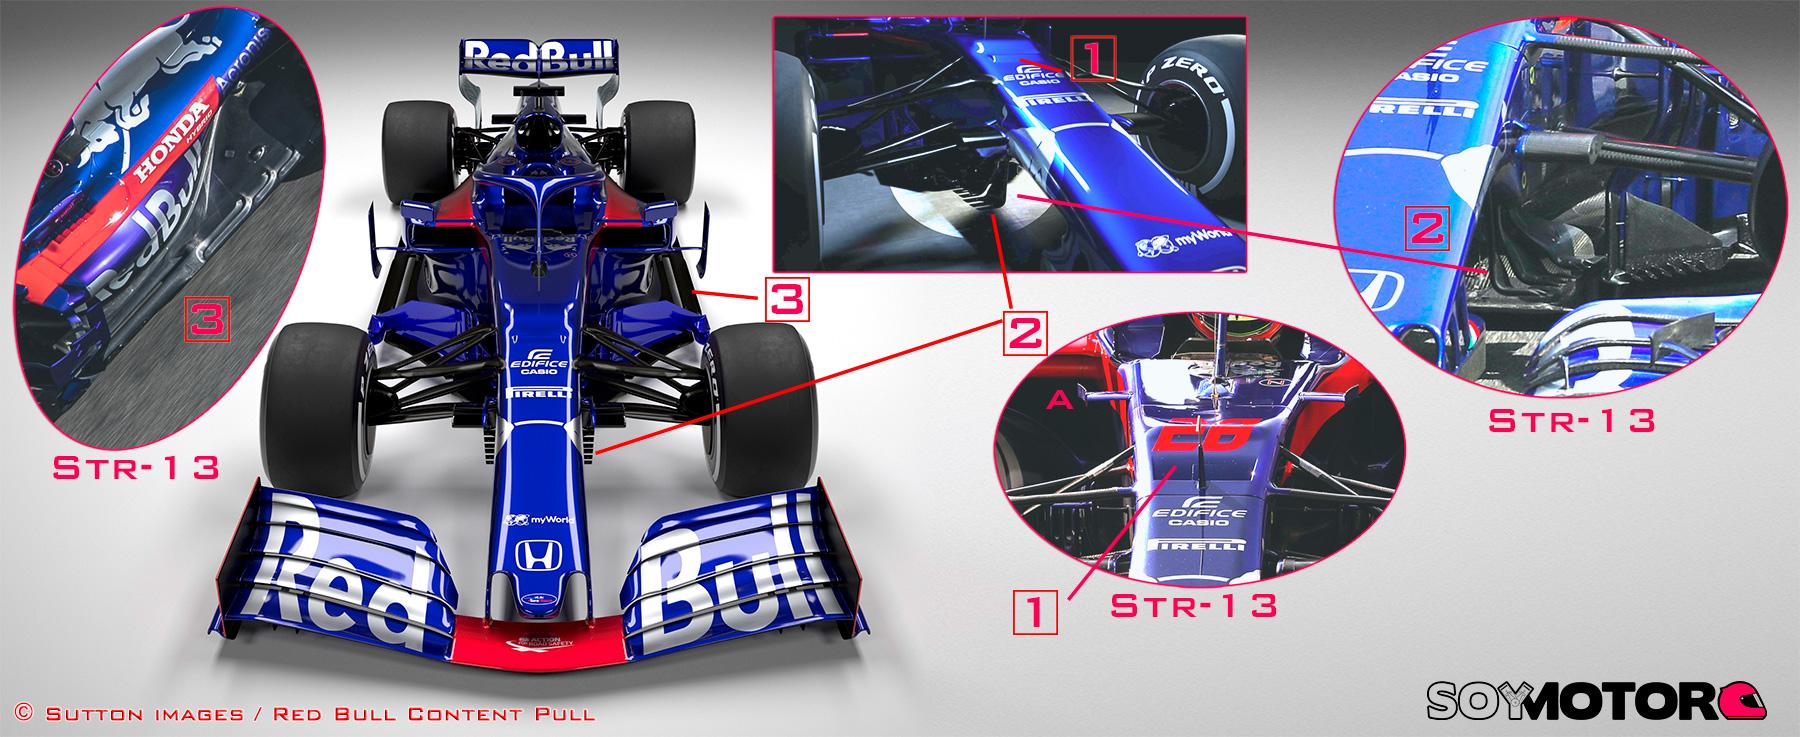 toro-rosso-str-14-frontal-arriba-soymotor.jpg